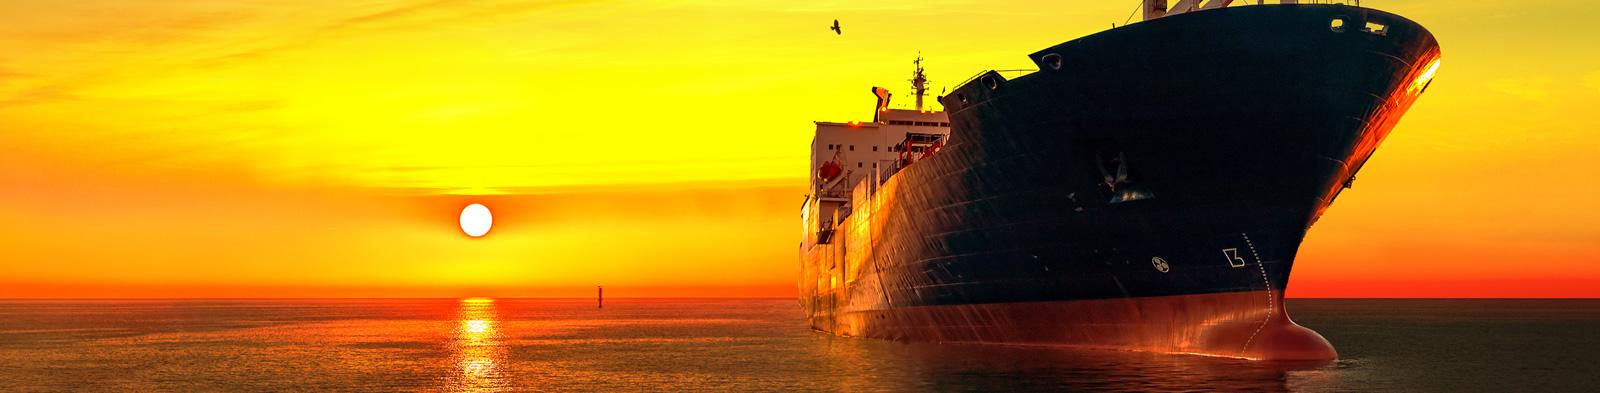 Oil tanker sailing at sunset